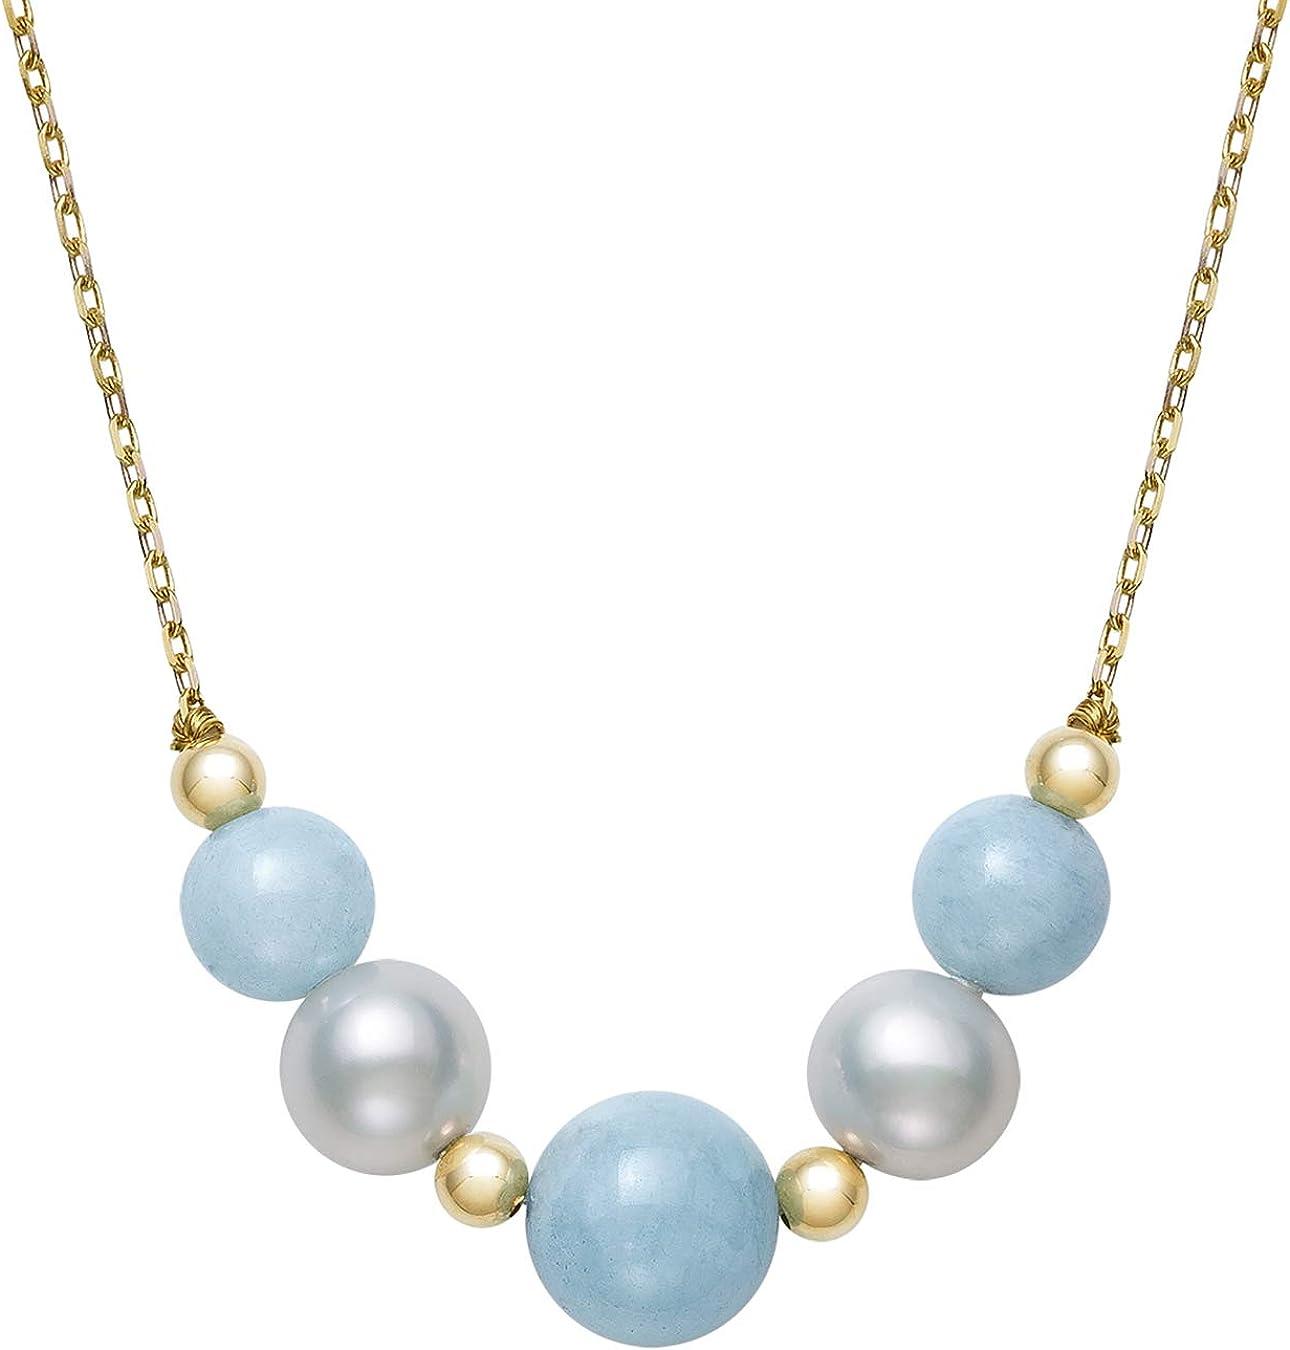 SALE,Mixed Cultured Pearl Aquamarine Necklace,Delicate Feminine Long Strand Layering Pearl and Aquamarine Gemstone Necklace,Designer Pearls,